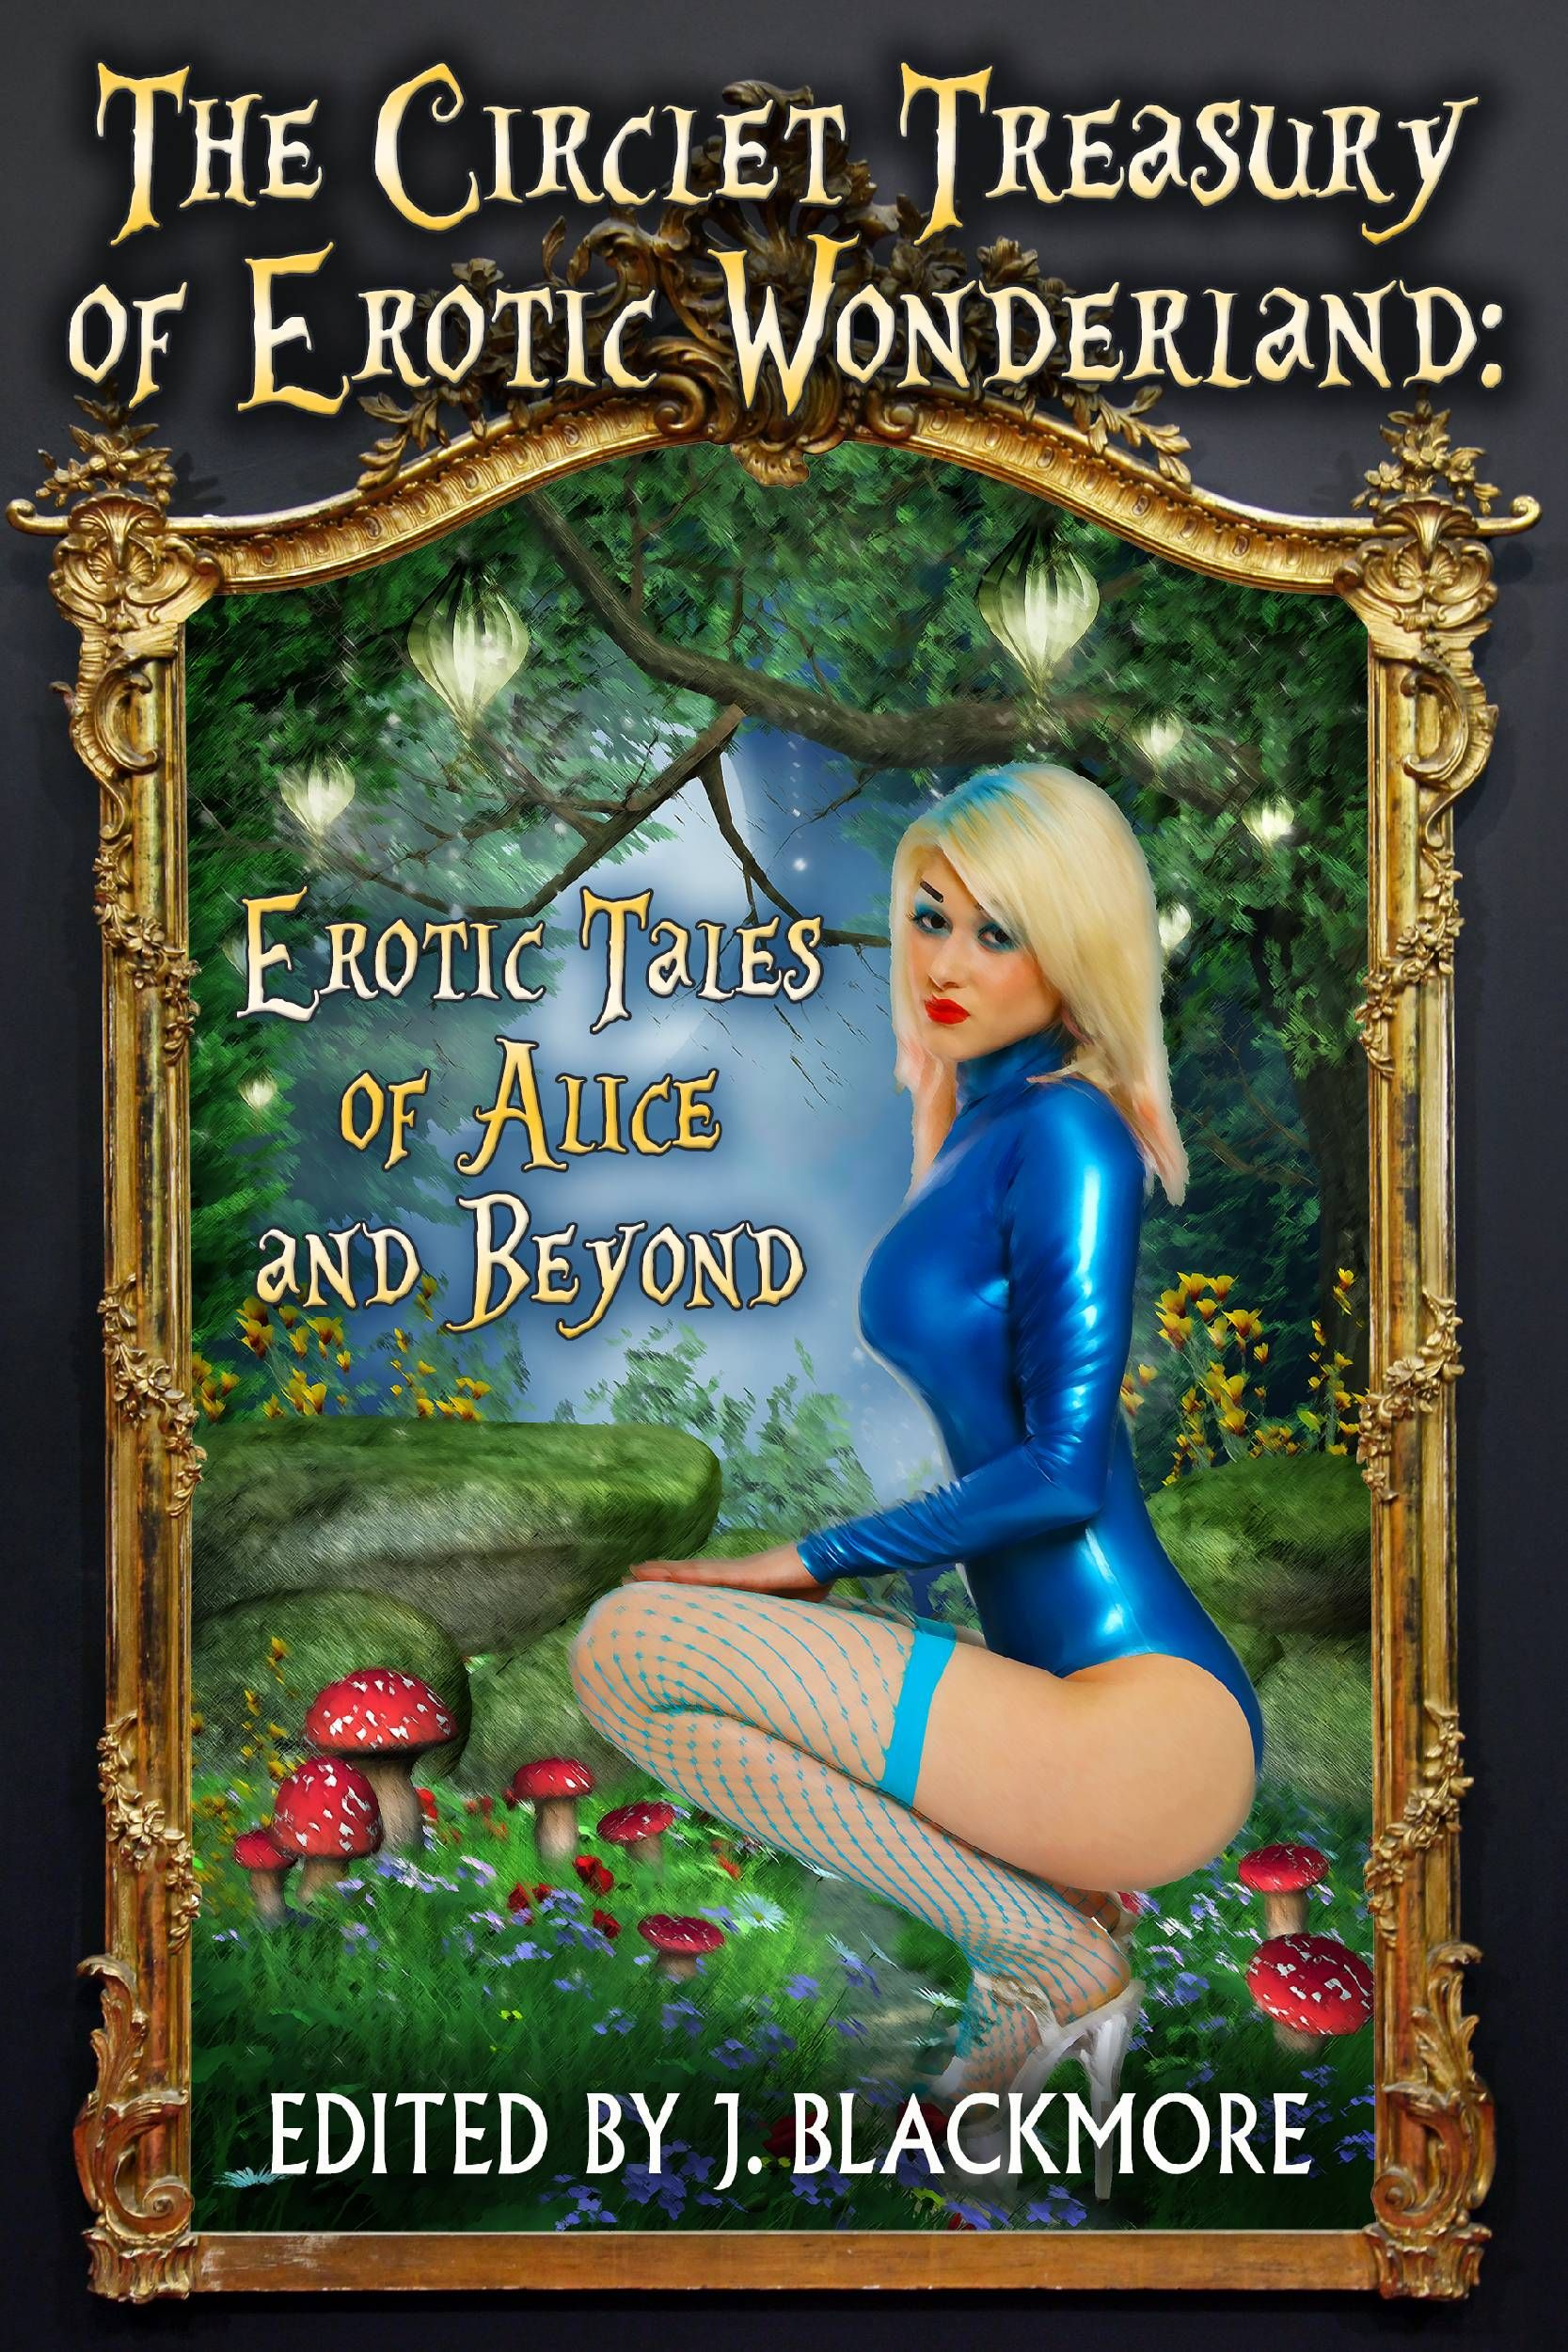 Wild erotic tales